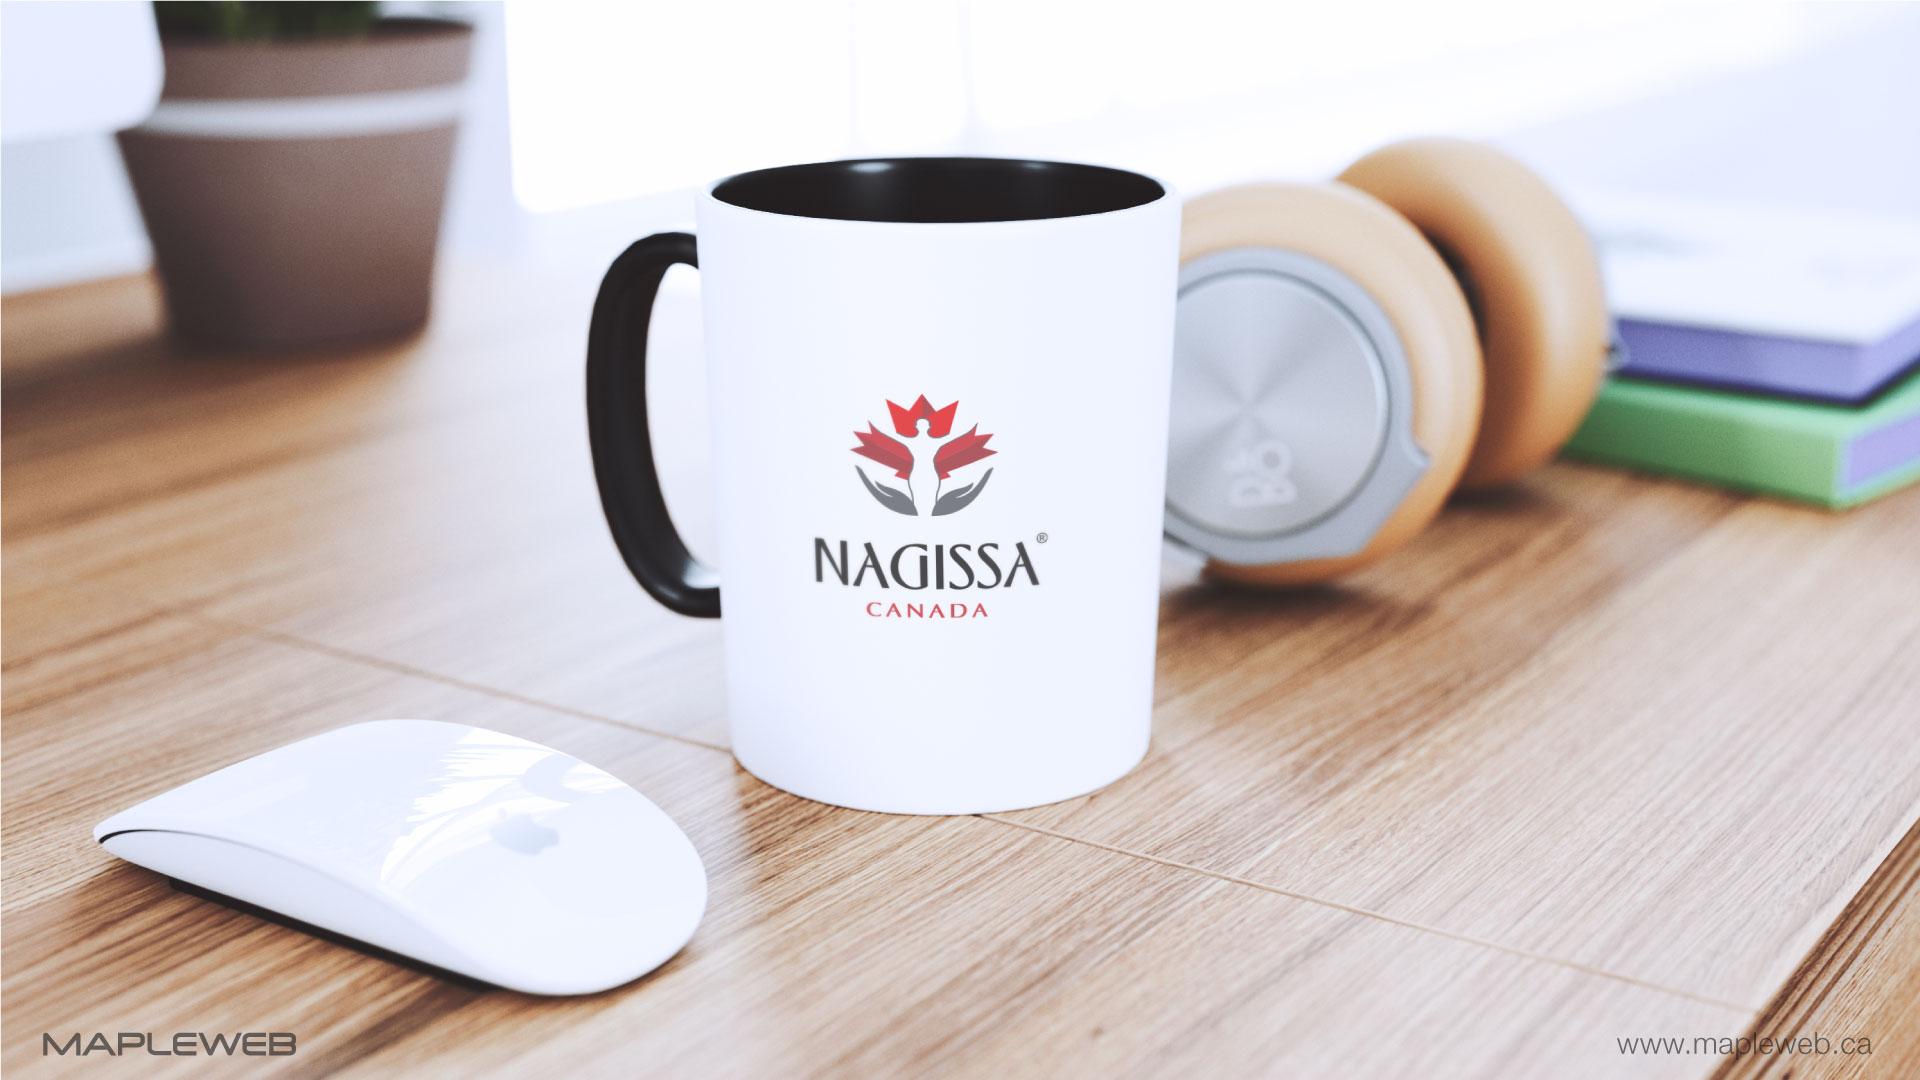 nagissa-canada-brand-logo-design-by-mapleweb-vancouver-canada-logo-on-mug-mock